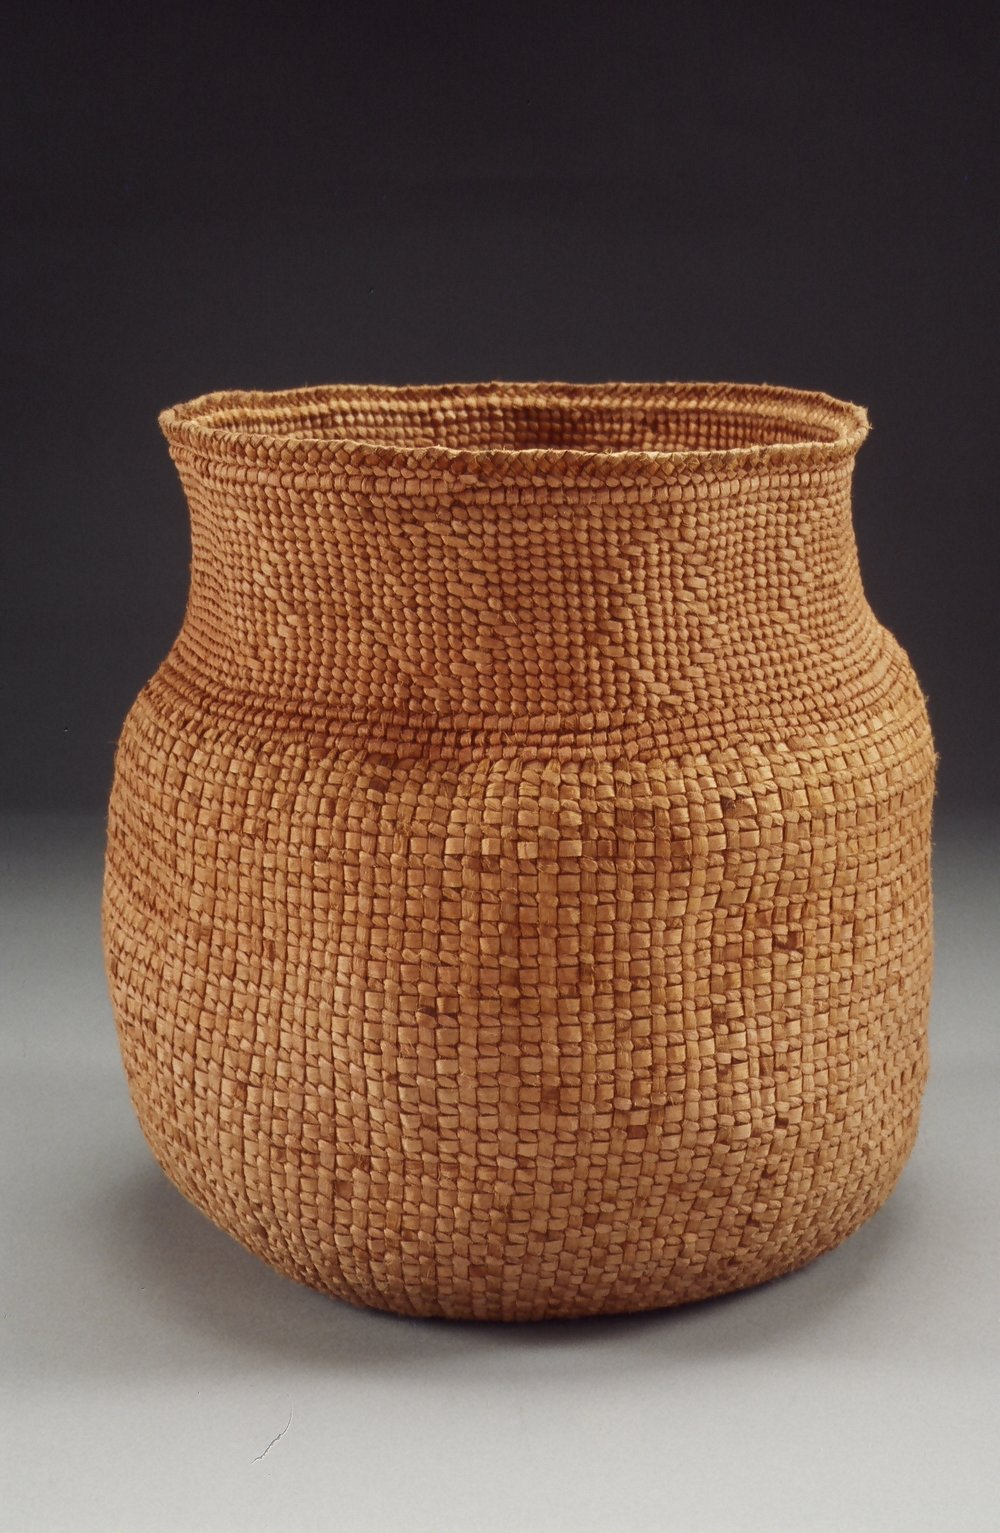 """Untitled #650"" by Jennifer Heller Zurick. 2006. Willow bark basket."